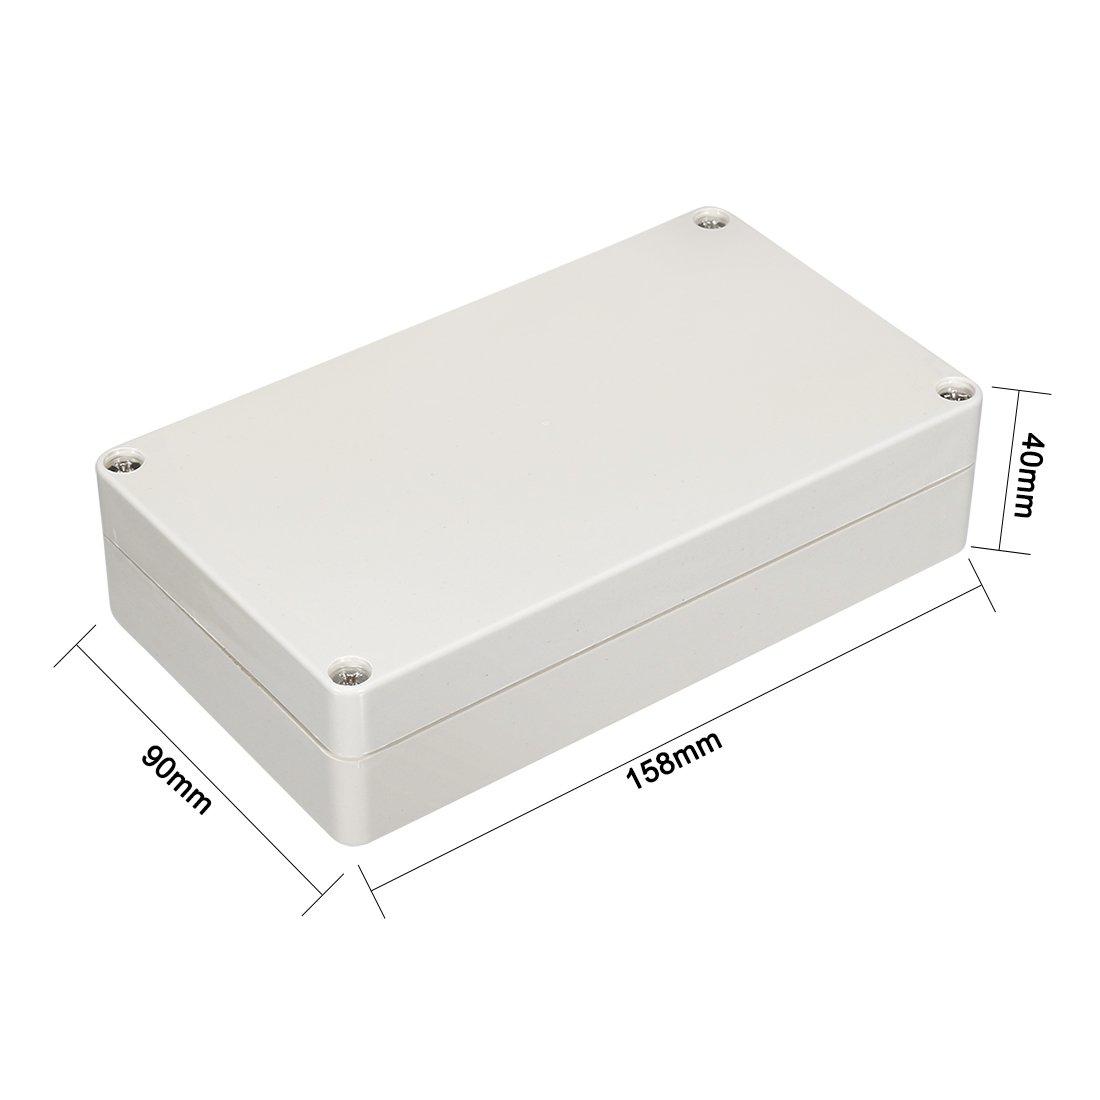 40mm elektronisches ABS Plastik Anschlusskasten Geh/äuse Anhang Grau sourcing map 158 90